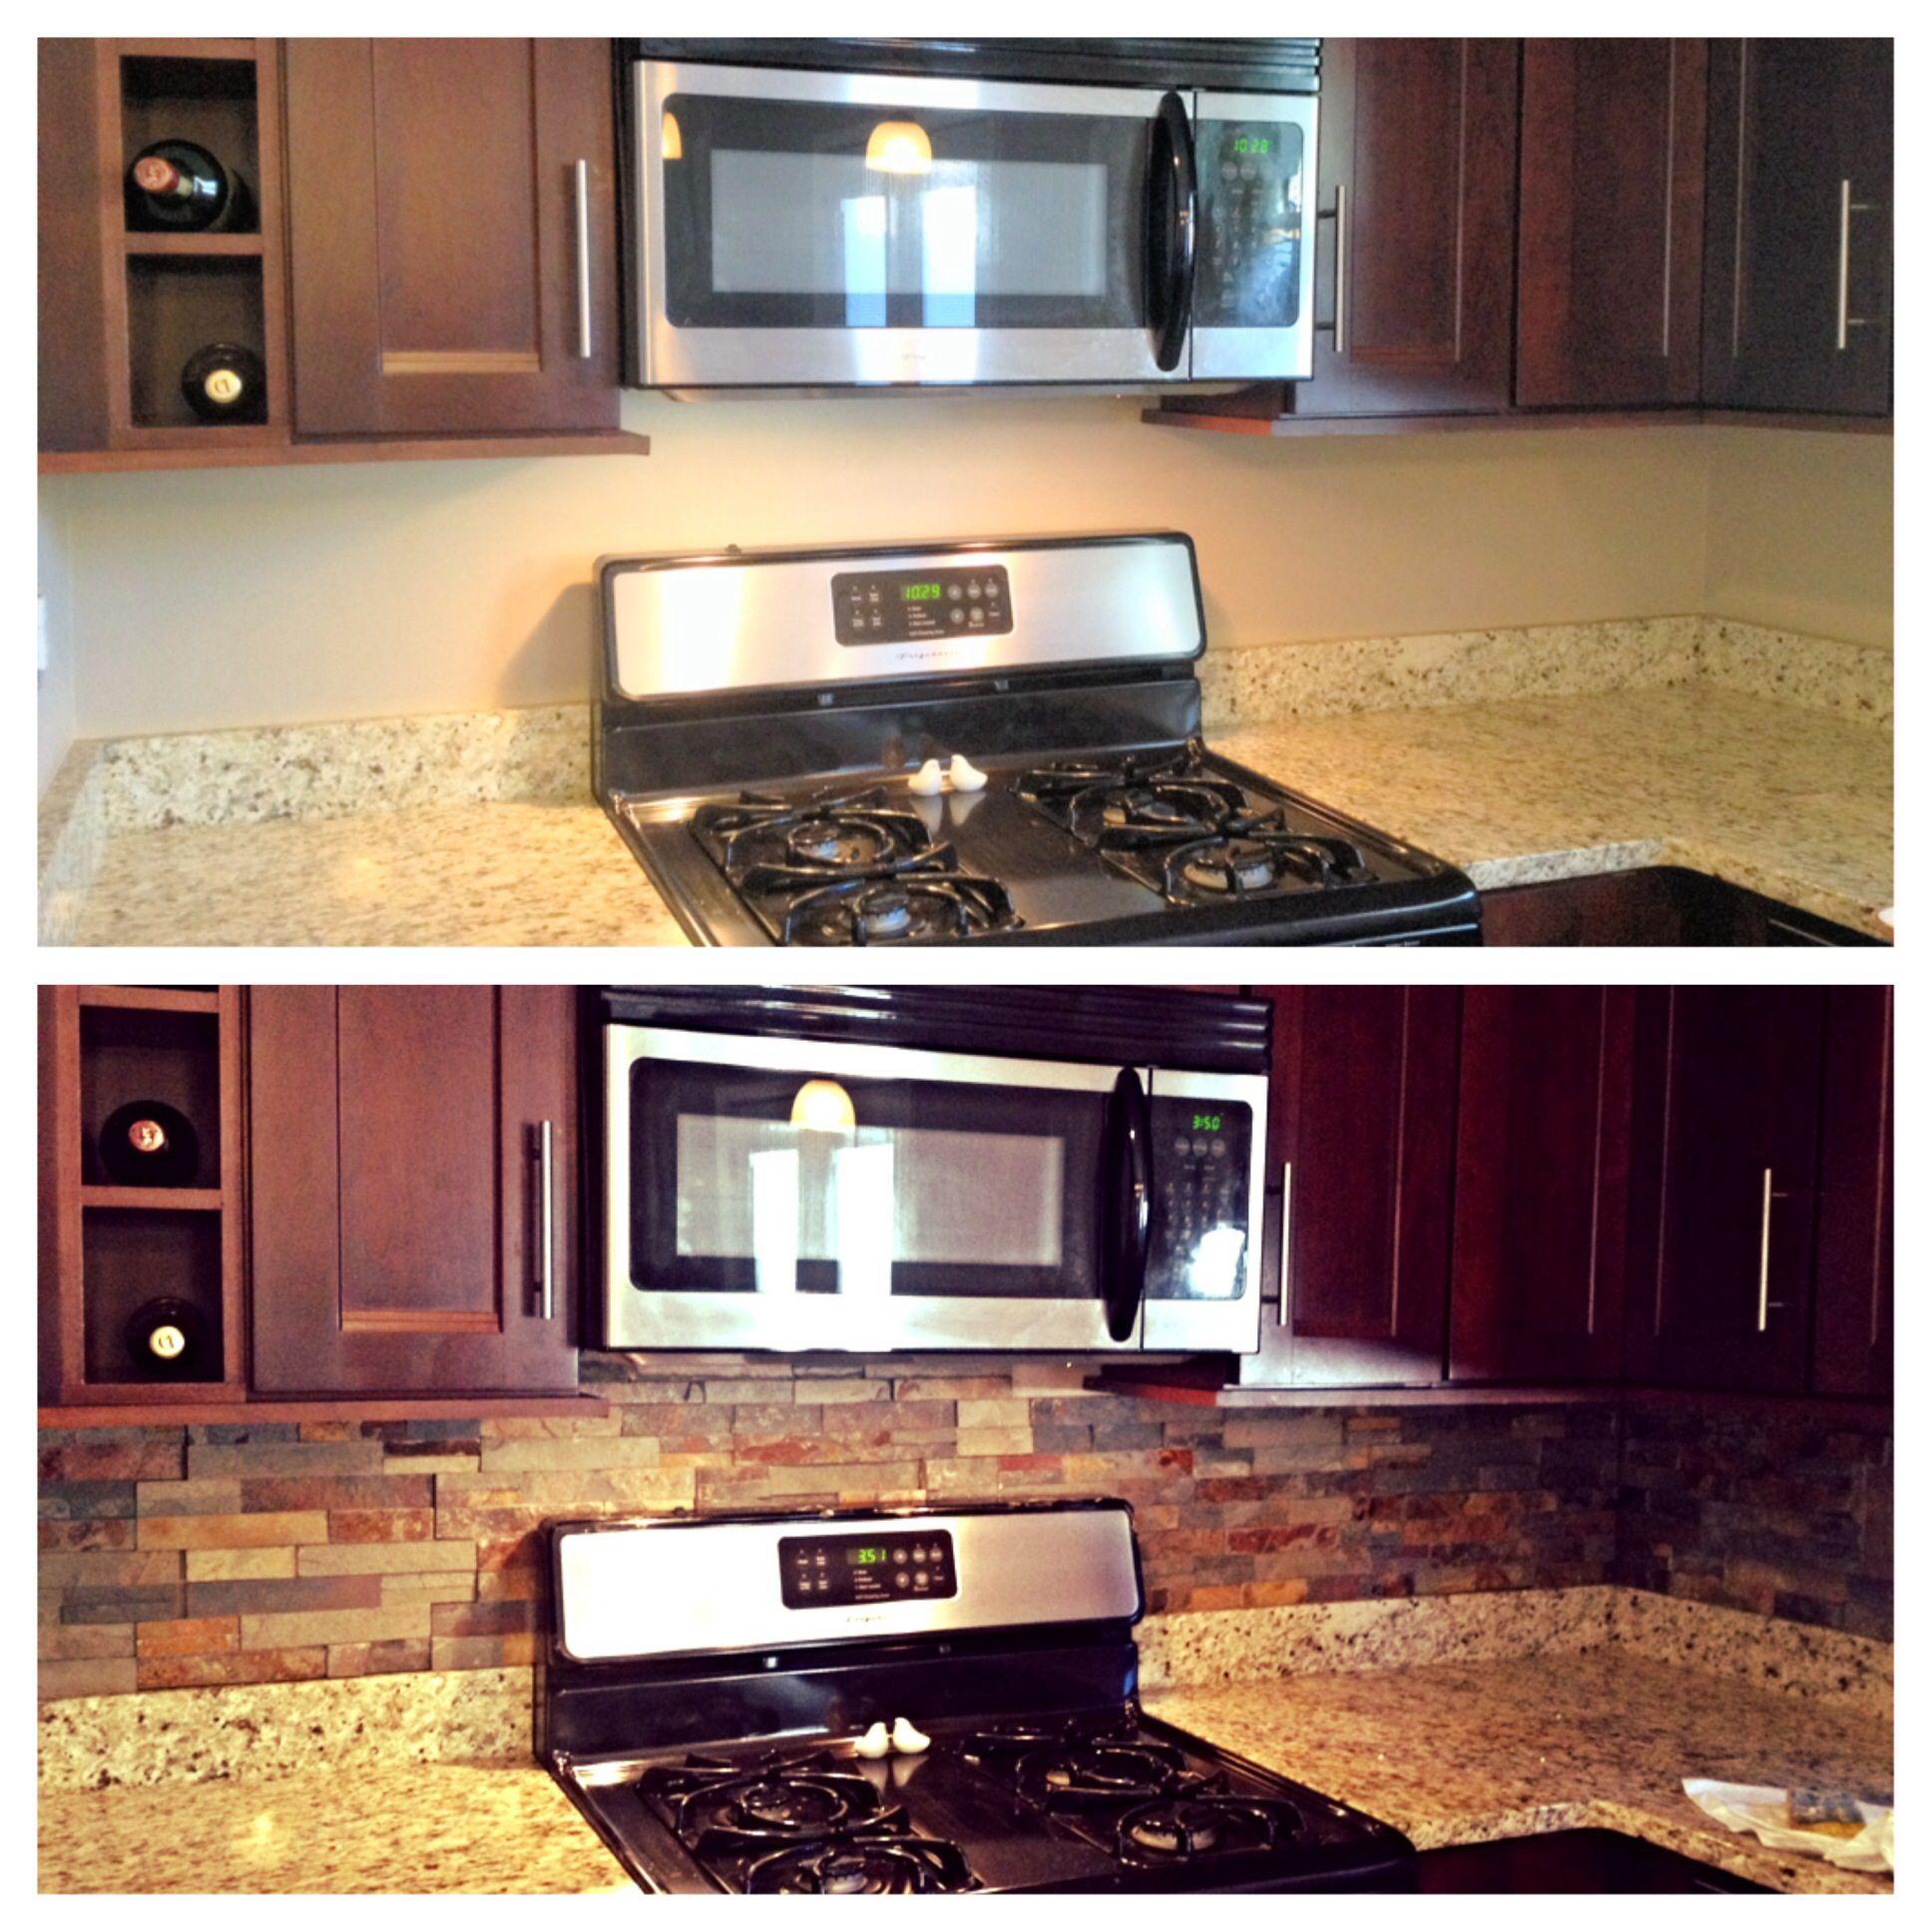 House Flip Kitchen Idea. Simple Improvement. Ledgestone